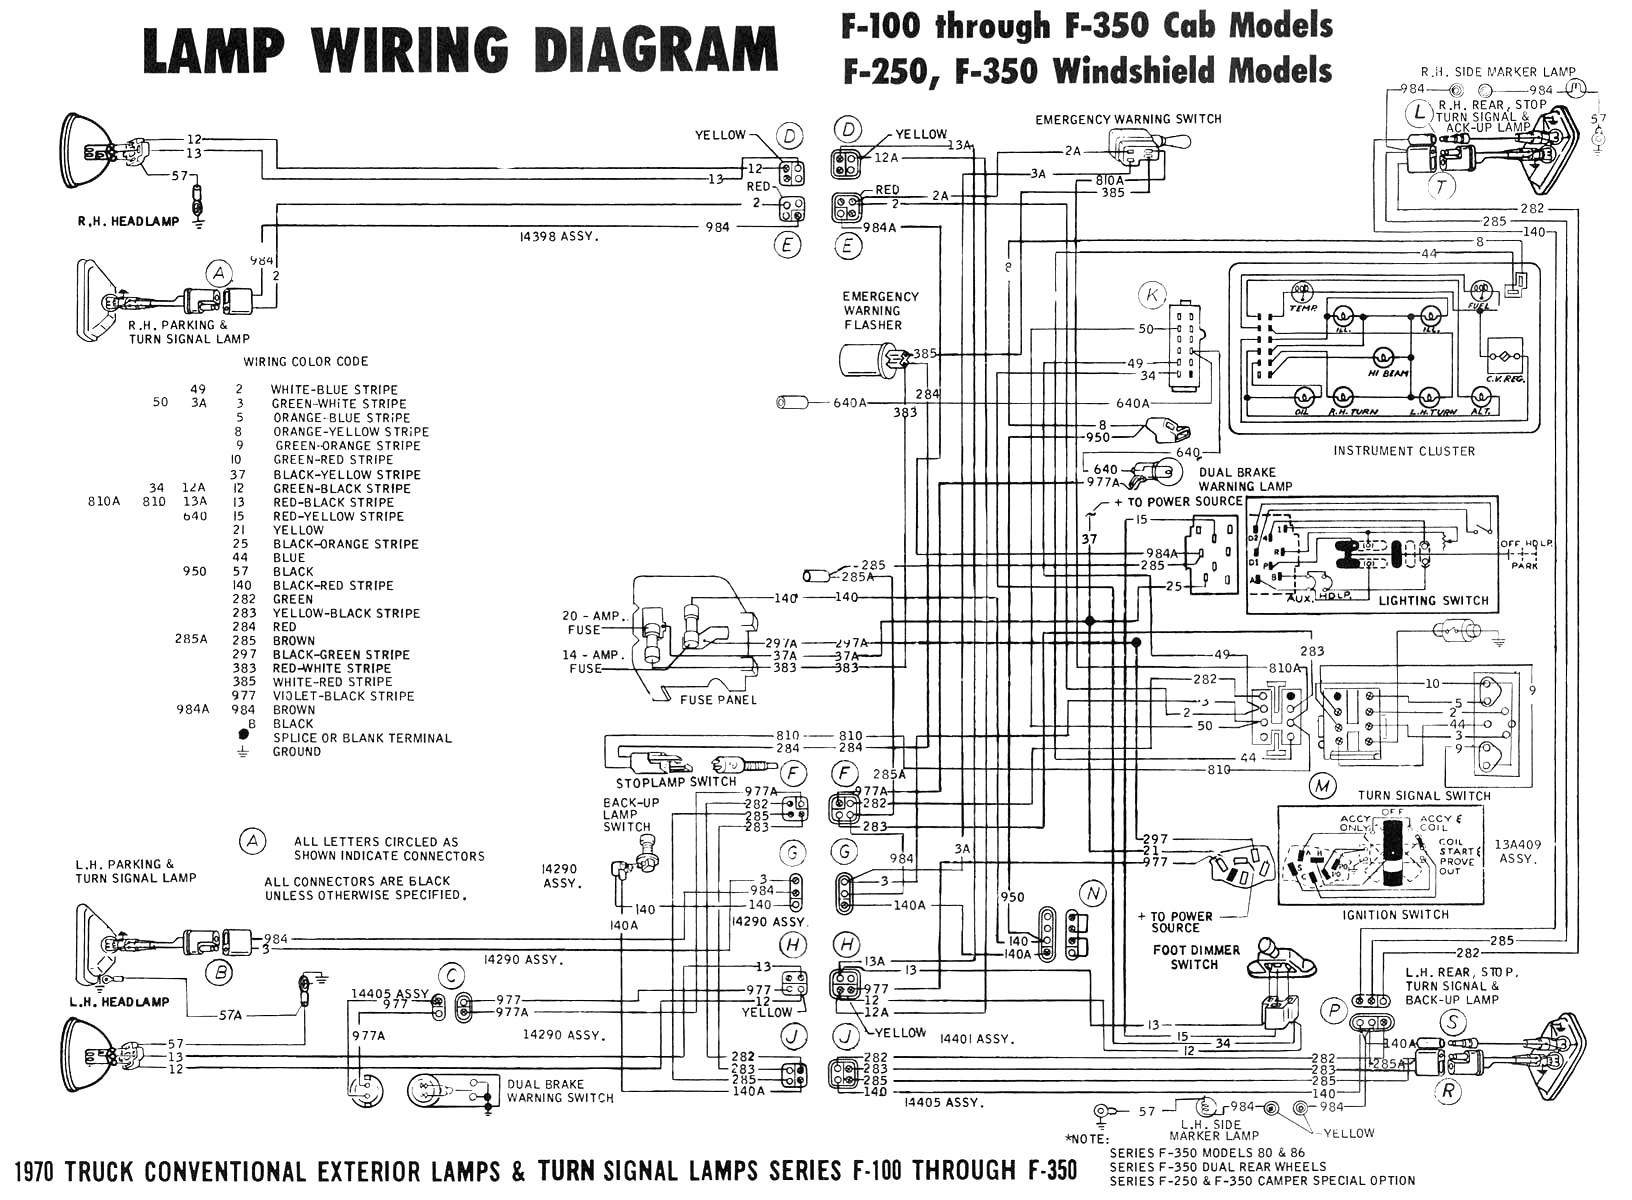 90 ford f 250 distributor wiring wiring diagram split 1963 ford f 250 distributor wiring